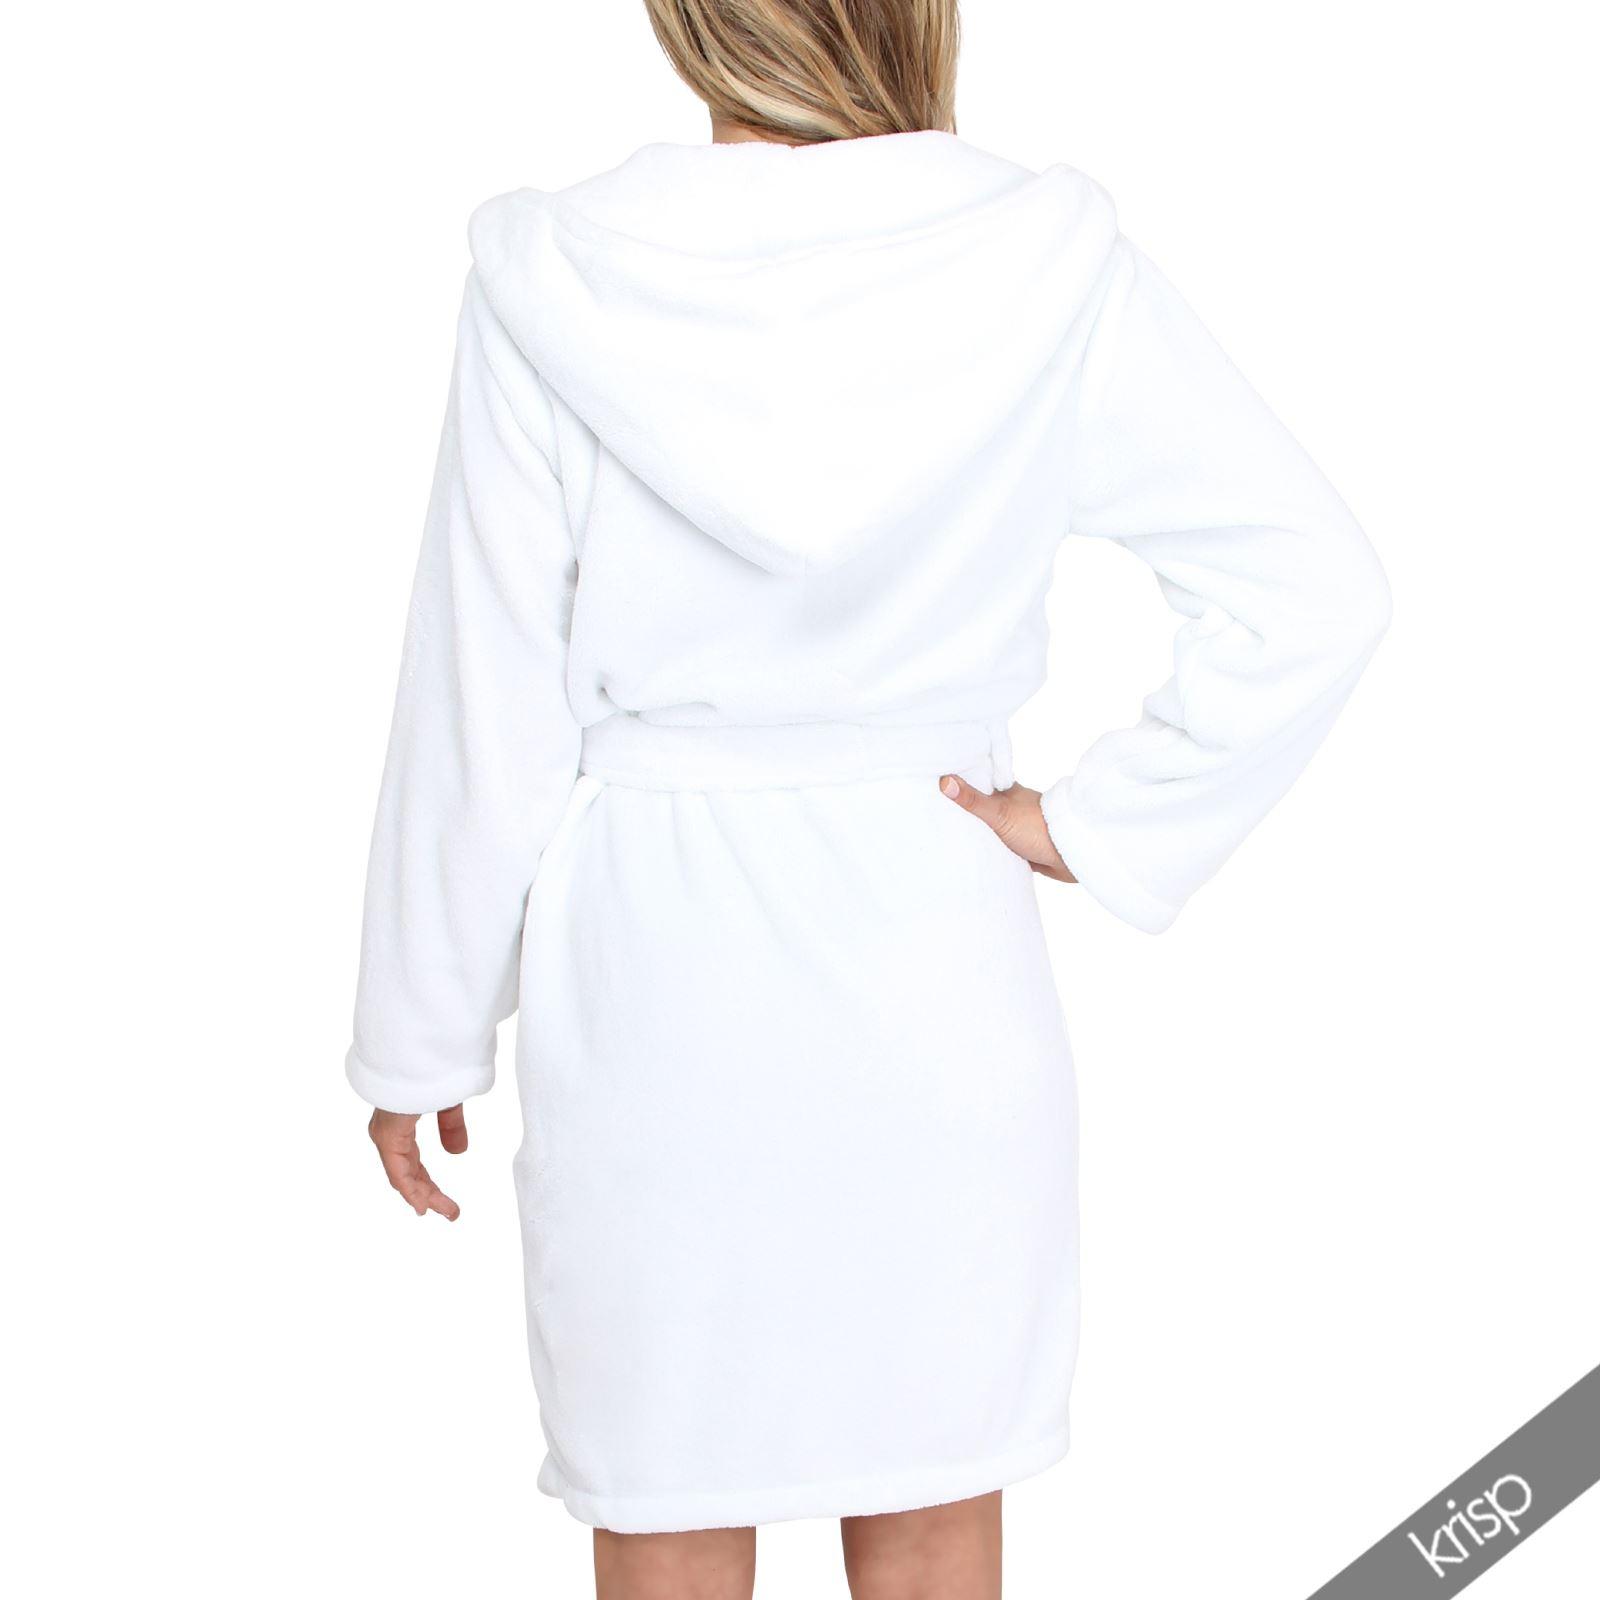 damen bademantel mit kapuze hausmantel morgenmantel fleece extra soft ebay. Black Bedroom Furniture Sets. Home Design Ideas